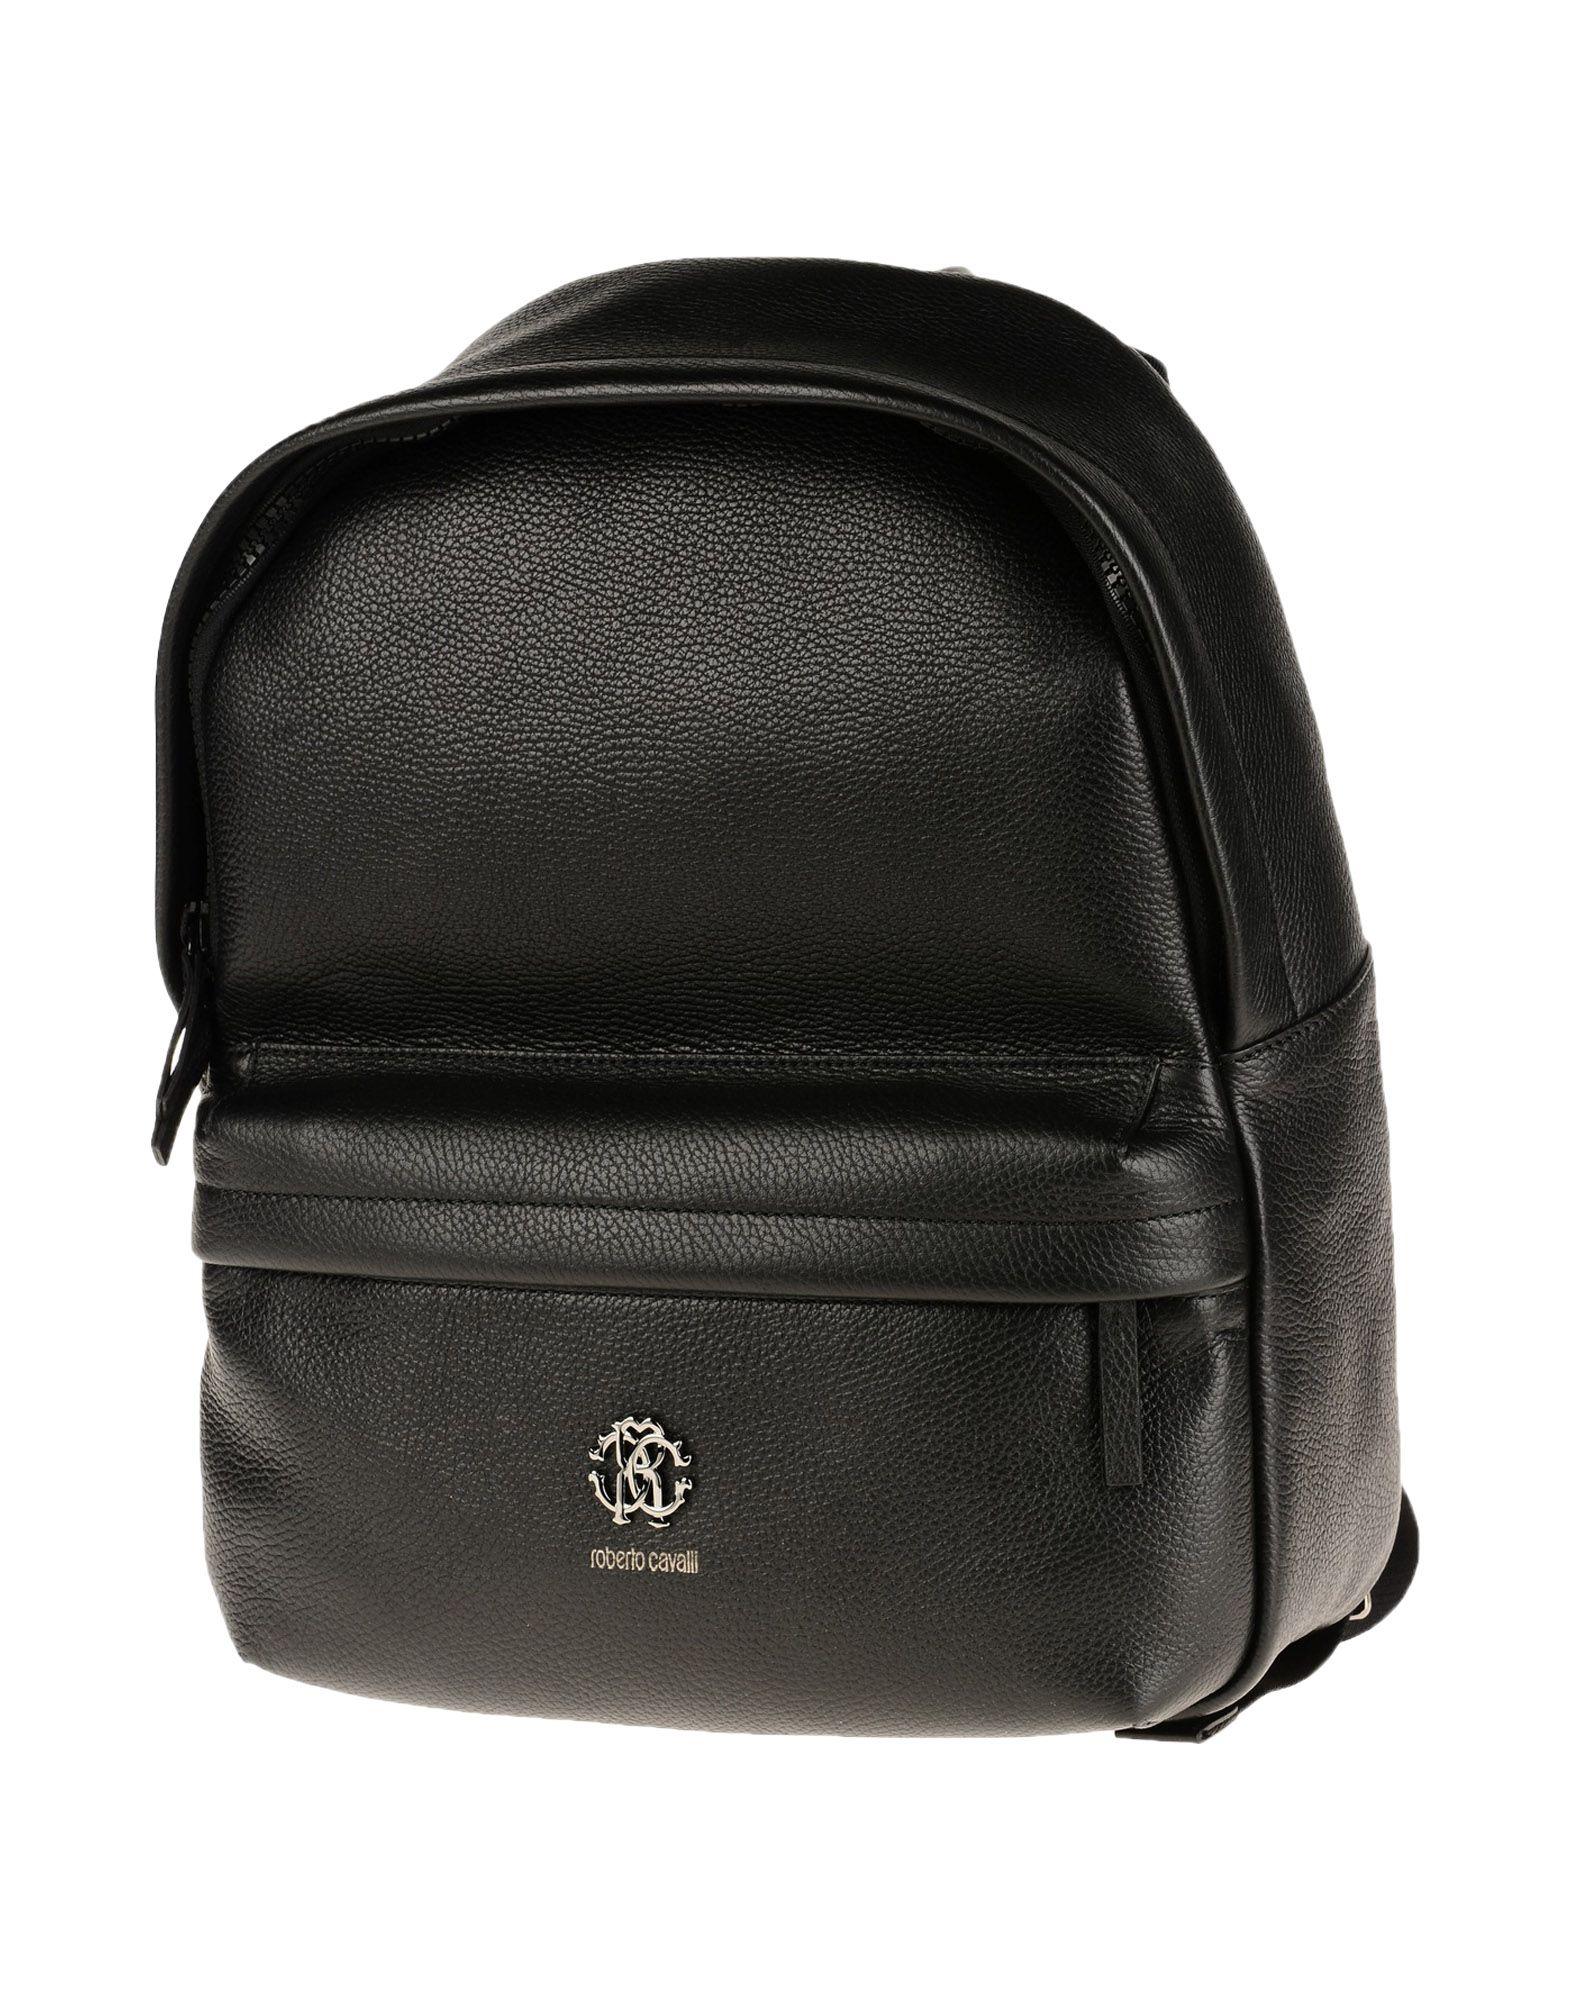 Just Cavalli HANDBAGS - Backpacks & Fanny packs su YOOX.COM kGvuYYmFZ